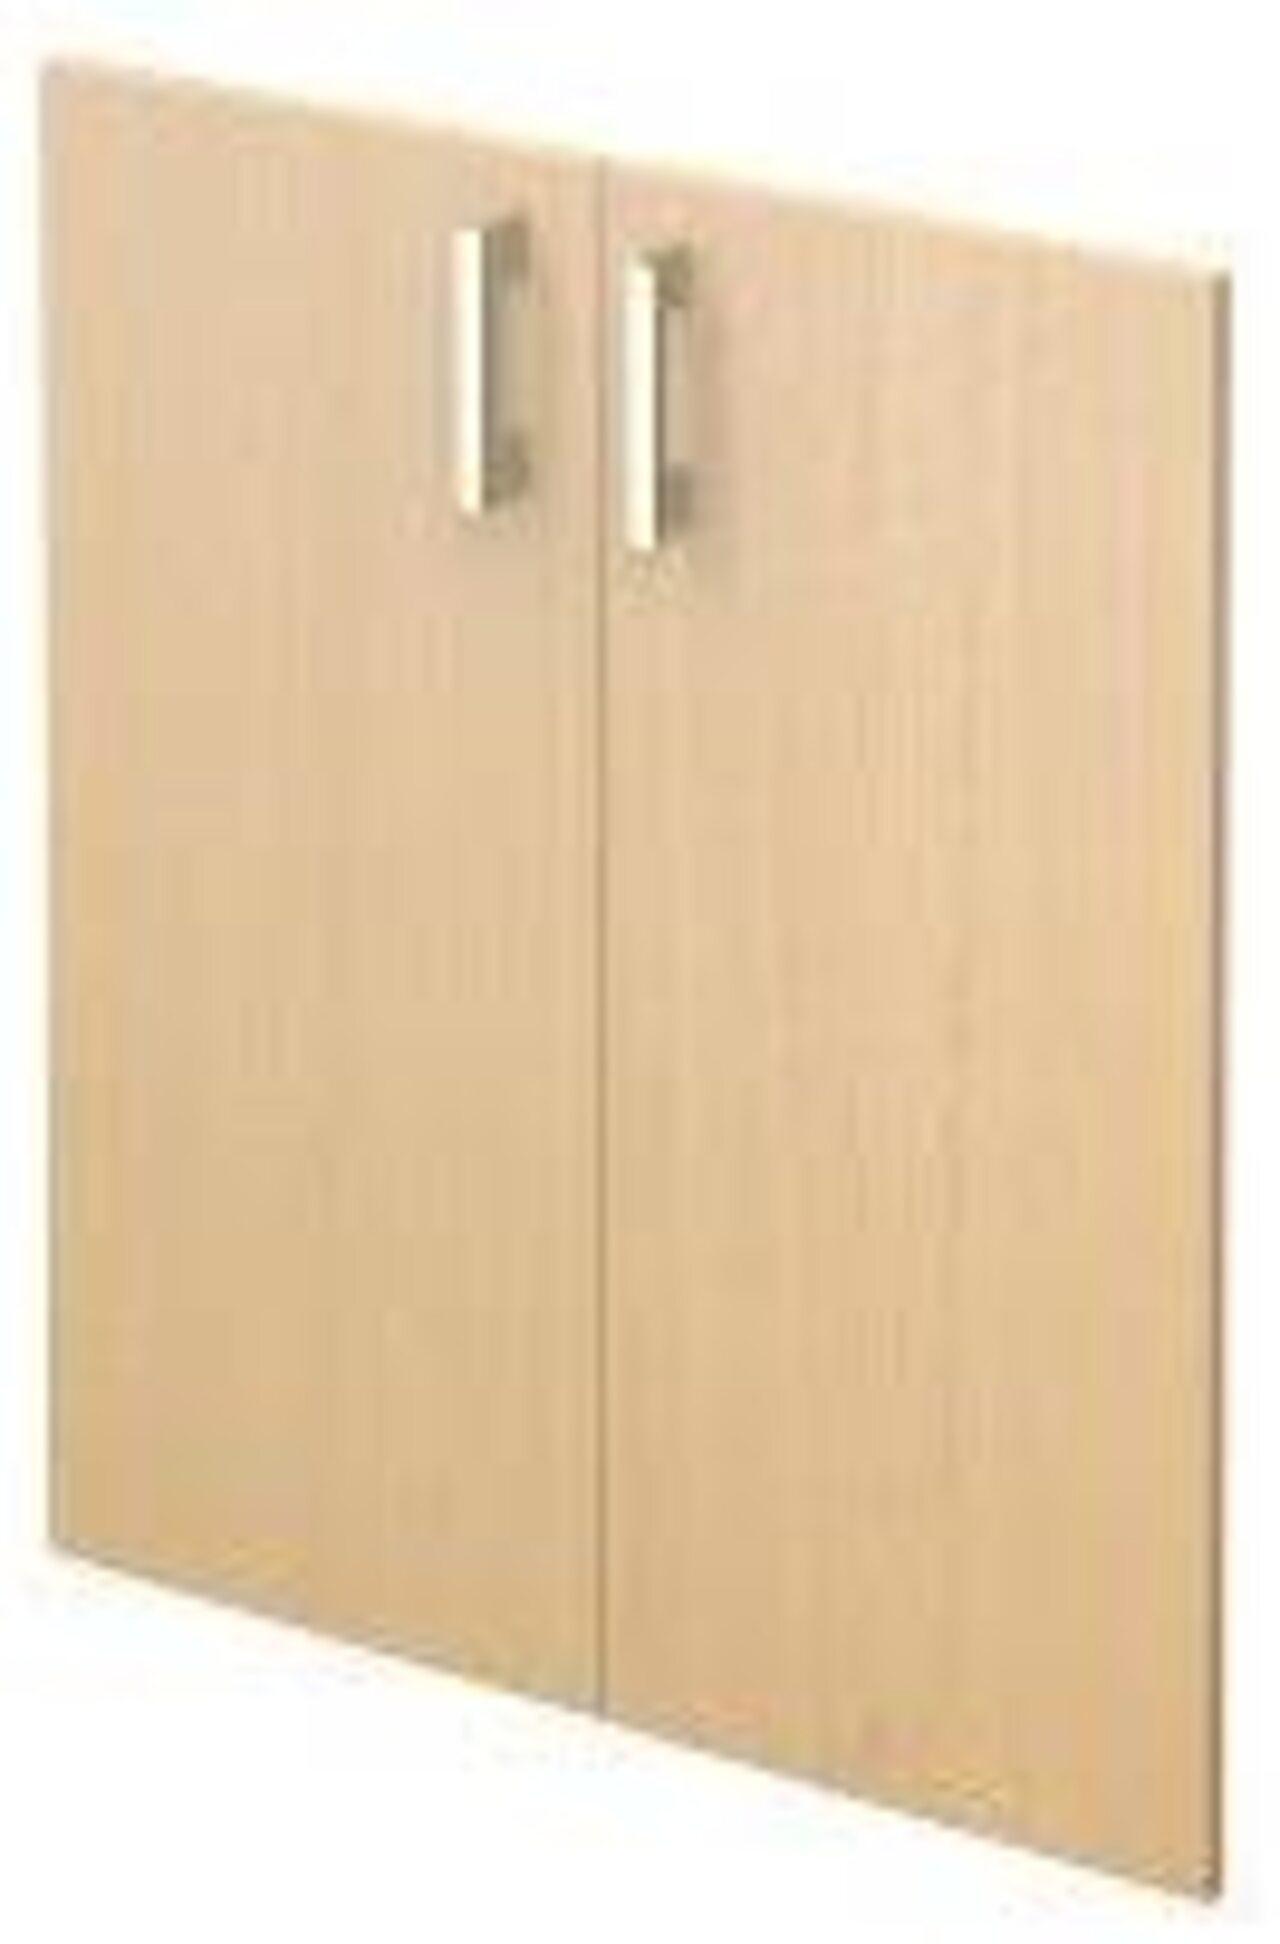 Двери для широких стеллажей - фото 2